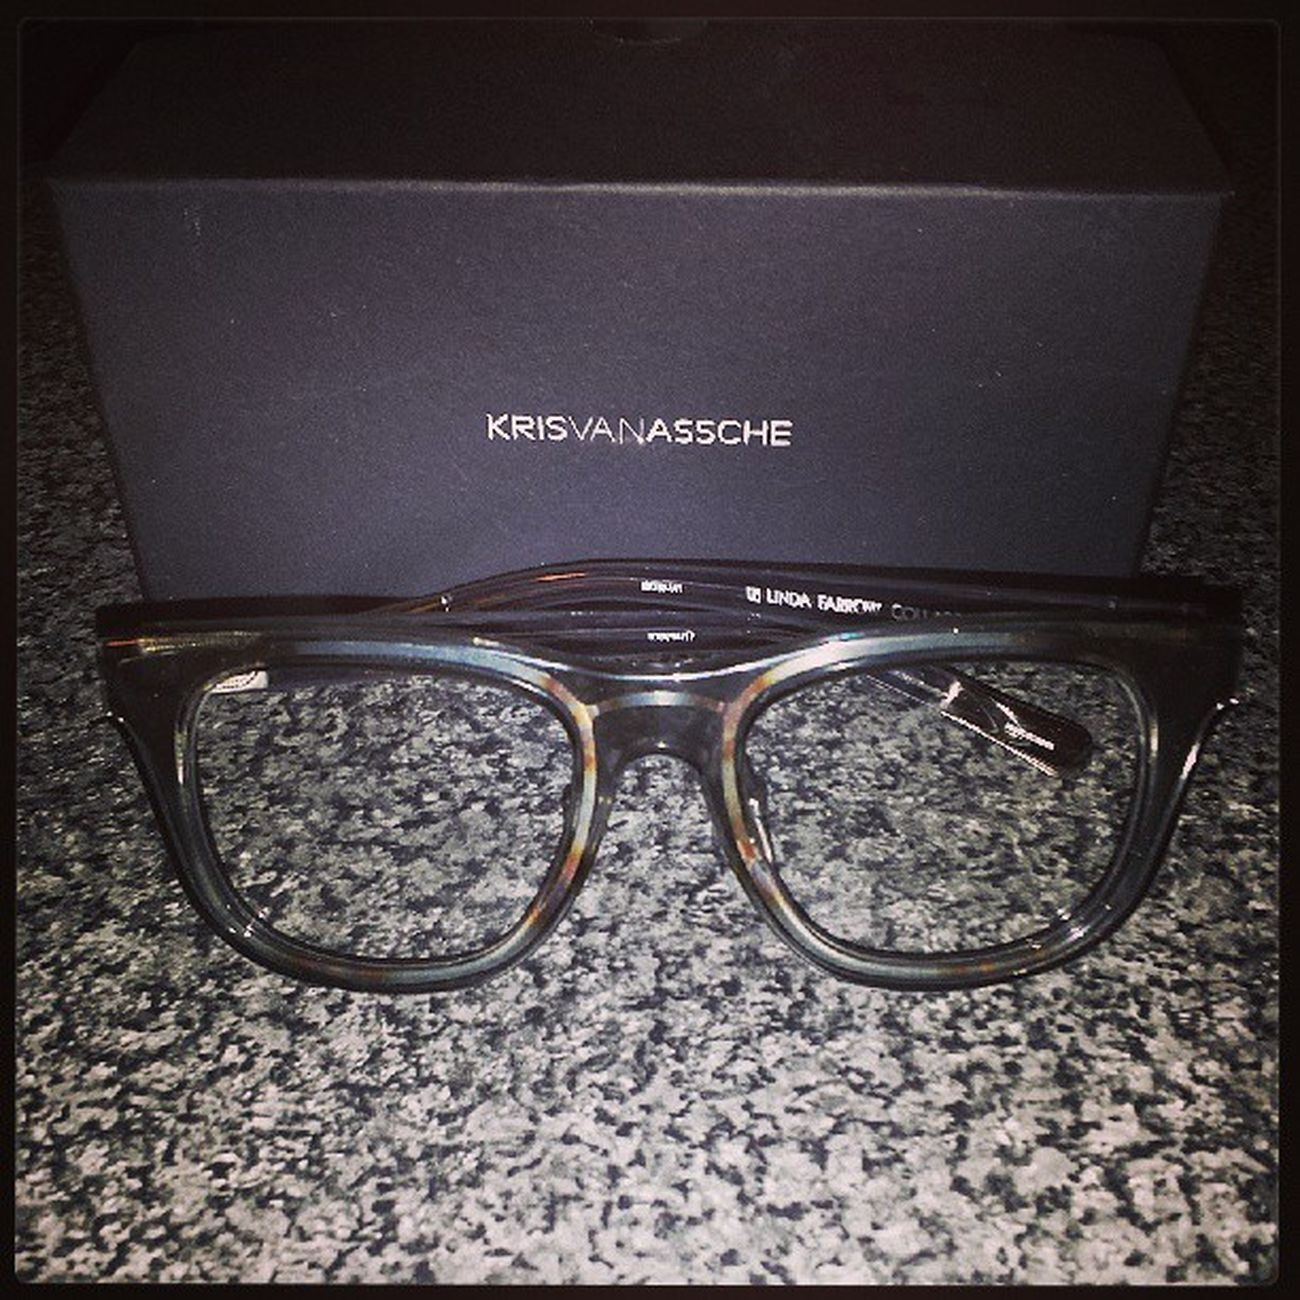 Gorgeous specs! ♡_♡HappyPanda GetOnMyFace NewOpticals LindaFarrow KrisVanAssche Fashion Classy KVA14s Igers IgersLondon SomersTown